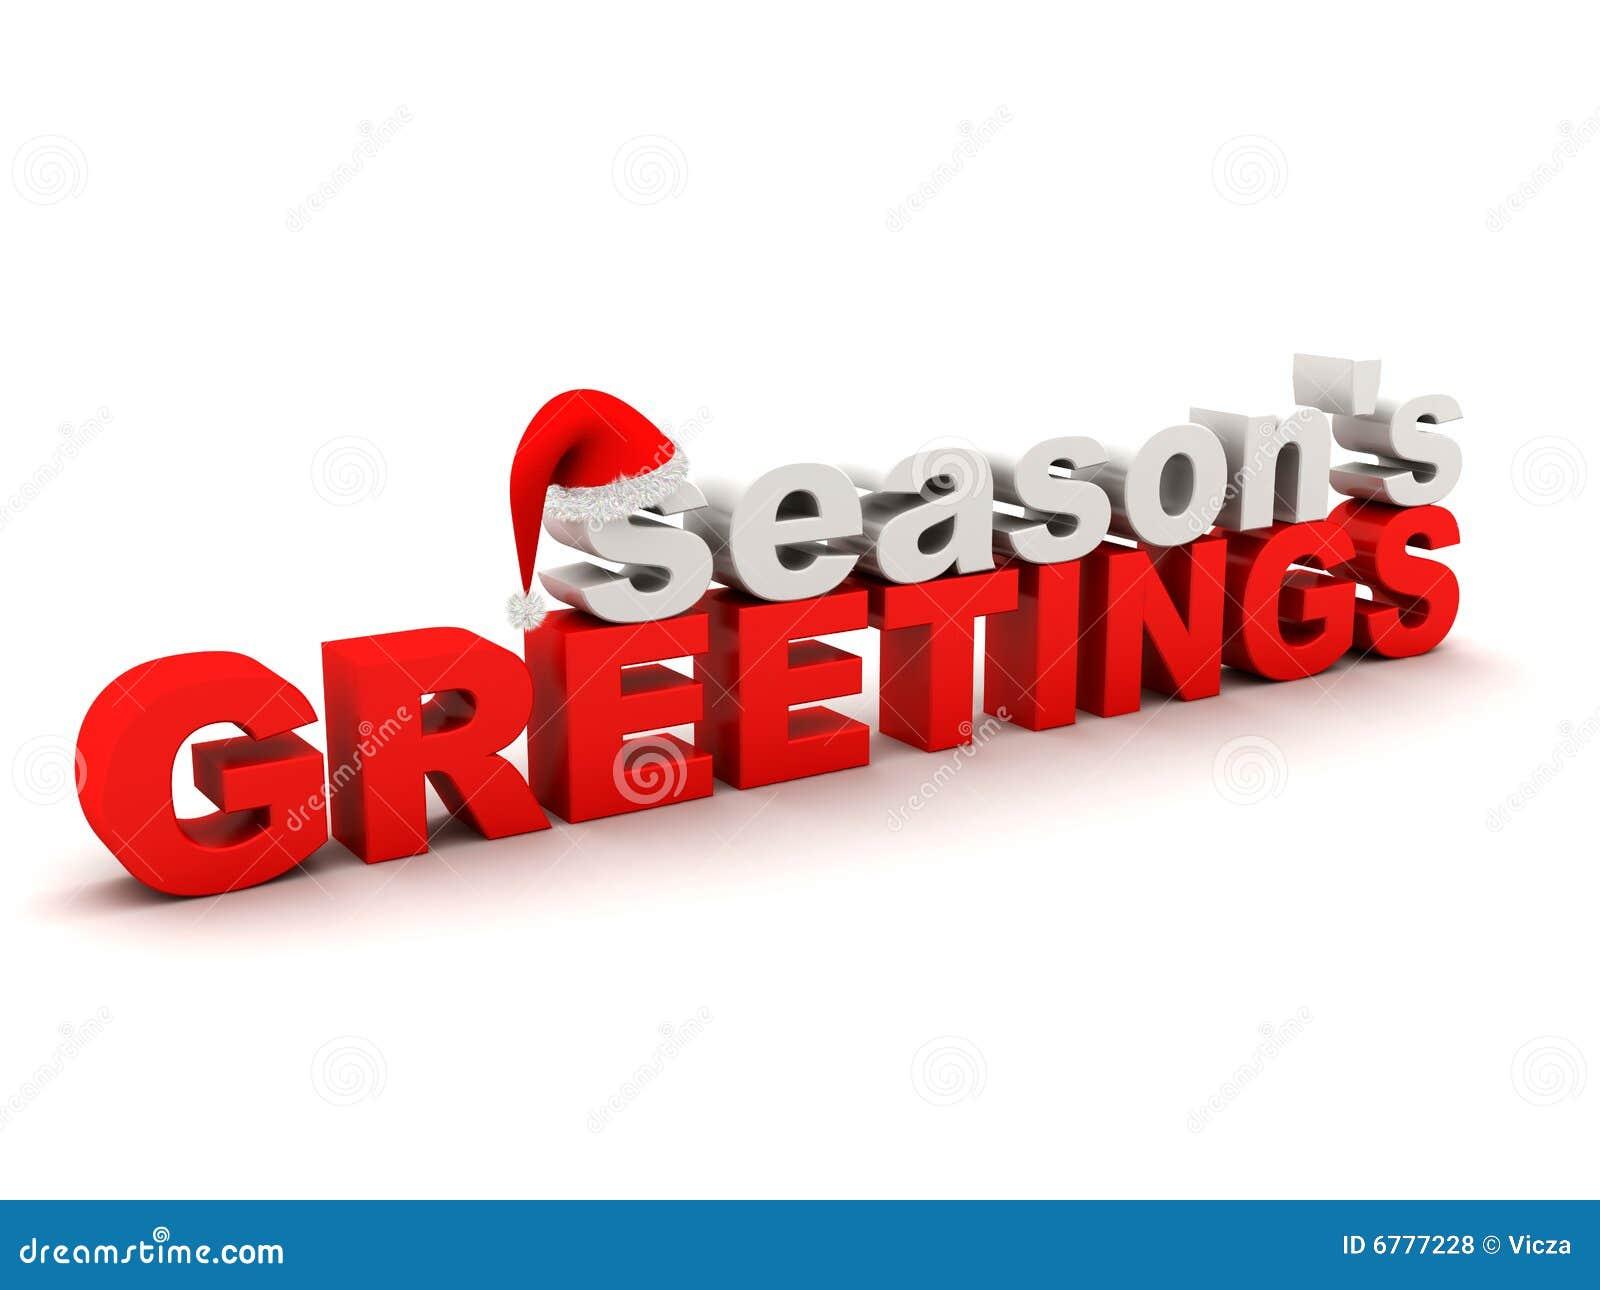 Seasons Greetings Text Royalty Free Stock Photos Image